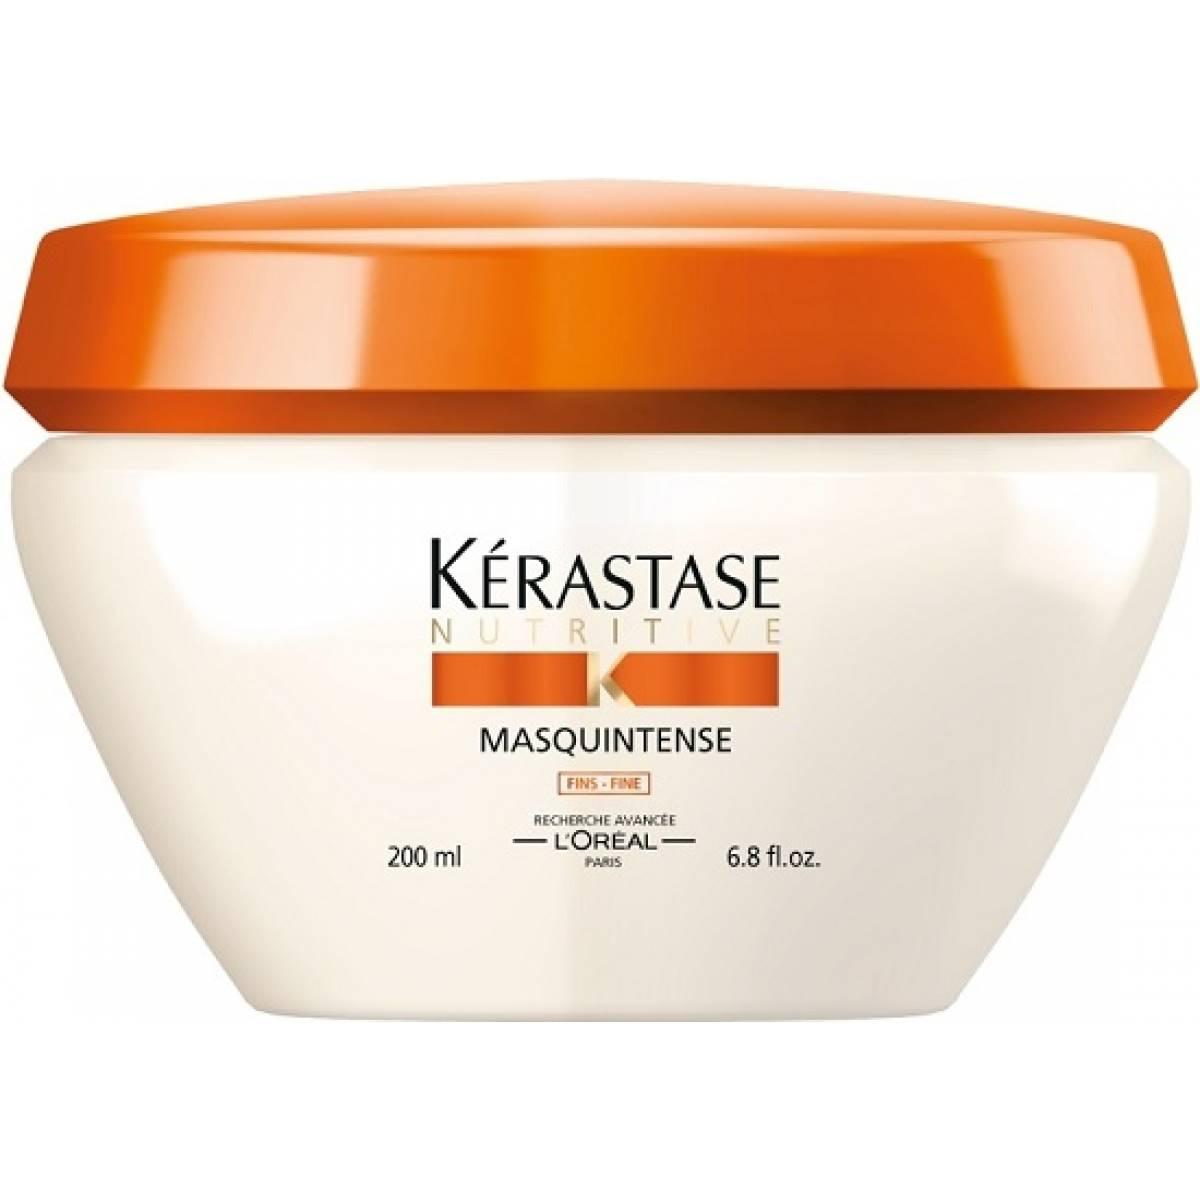 mascara_kerastase_nutritive_masquintense_cabelos_finos_200g_375_1_20171101151555